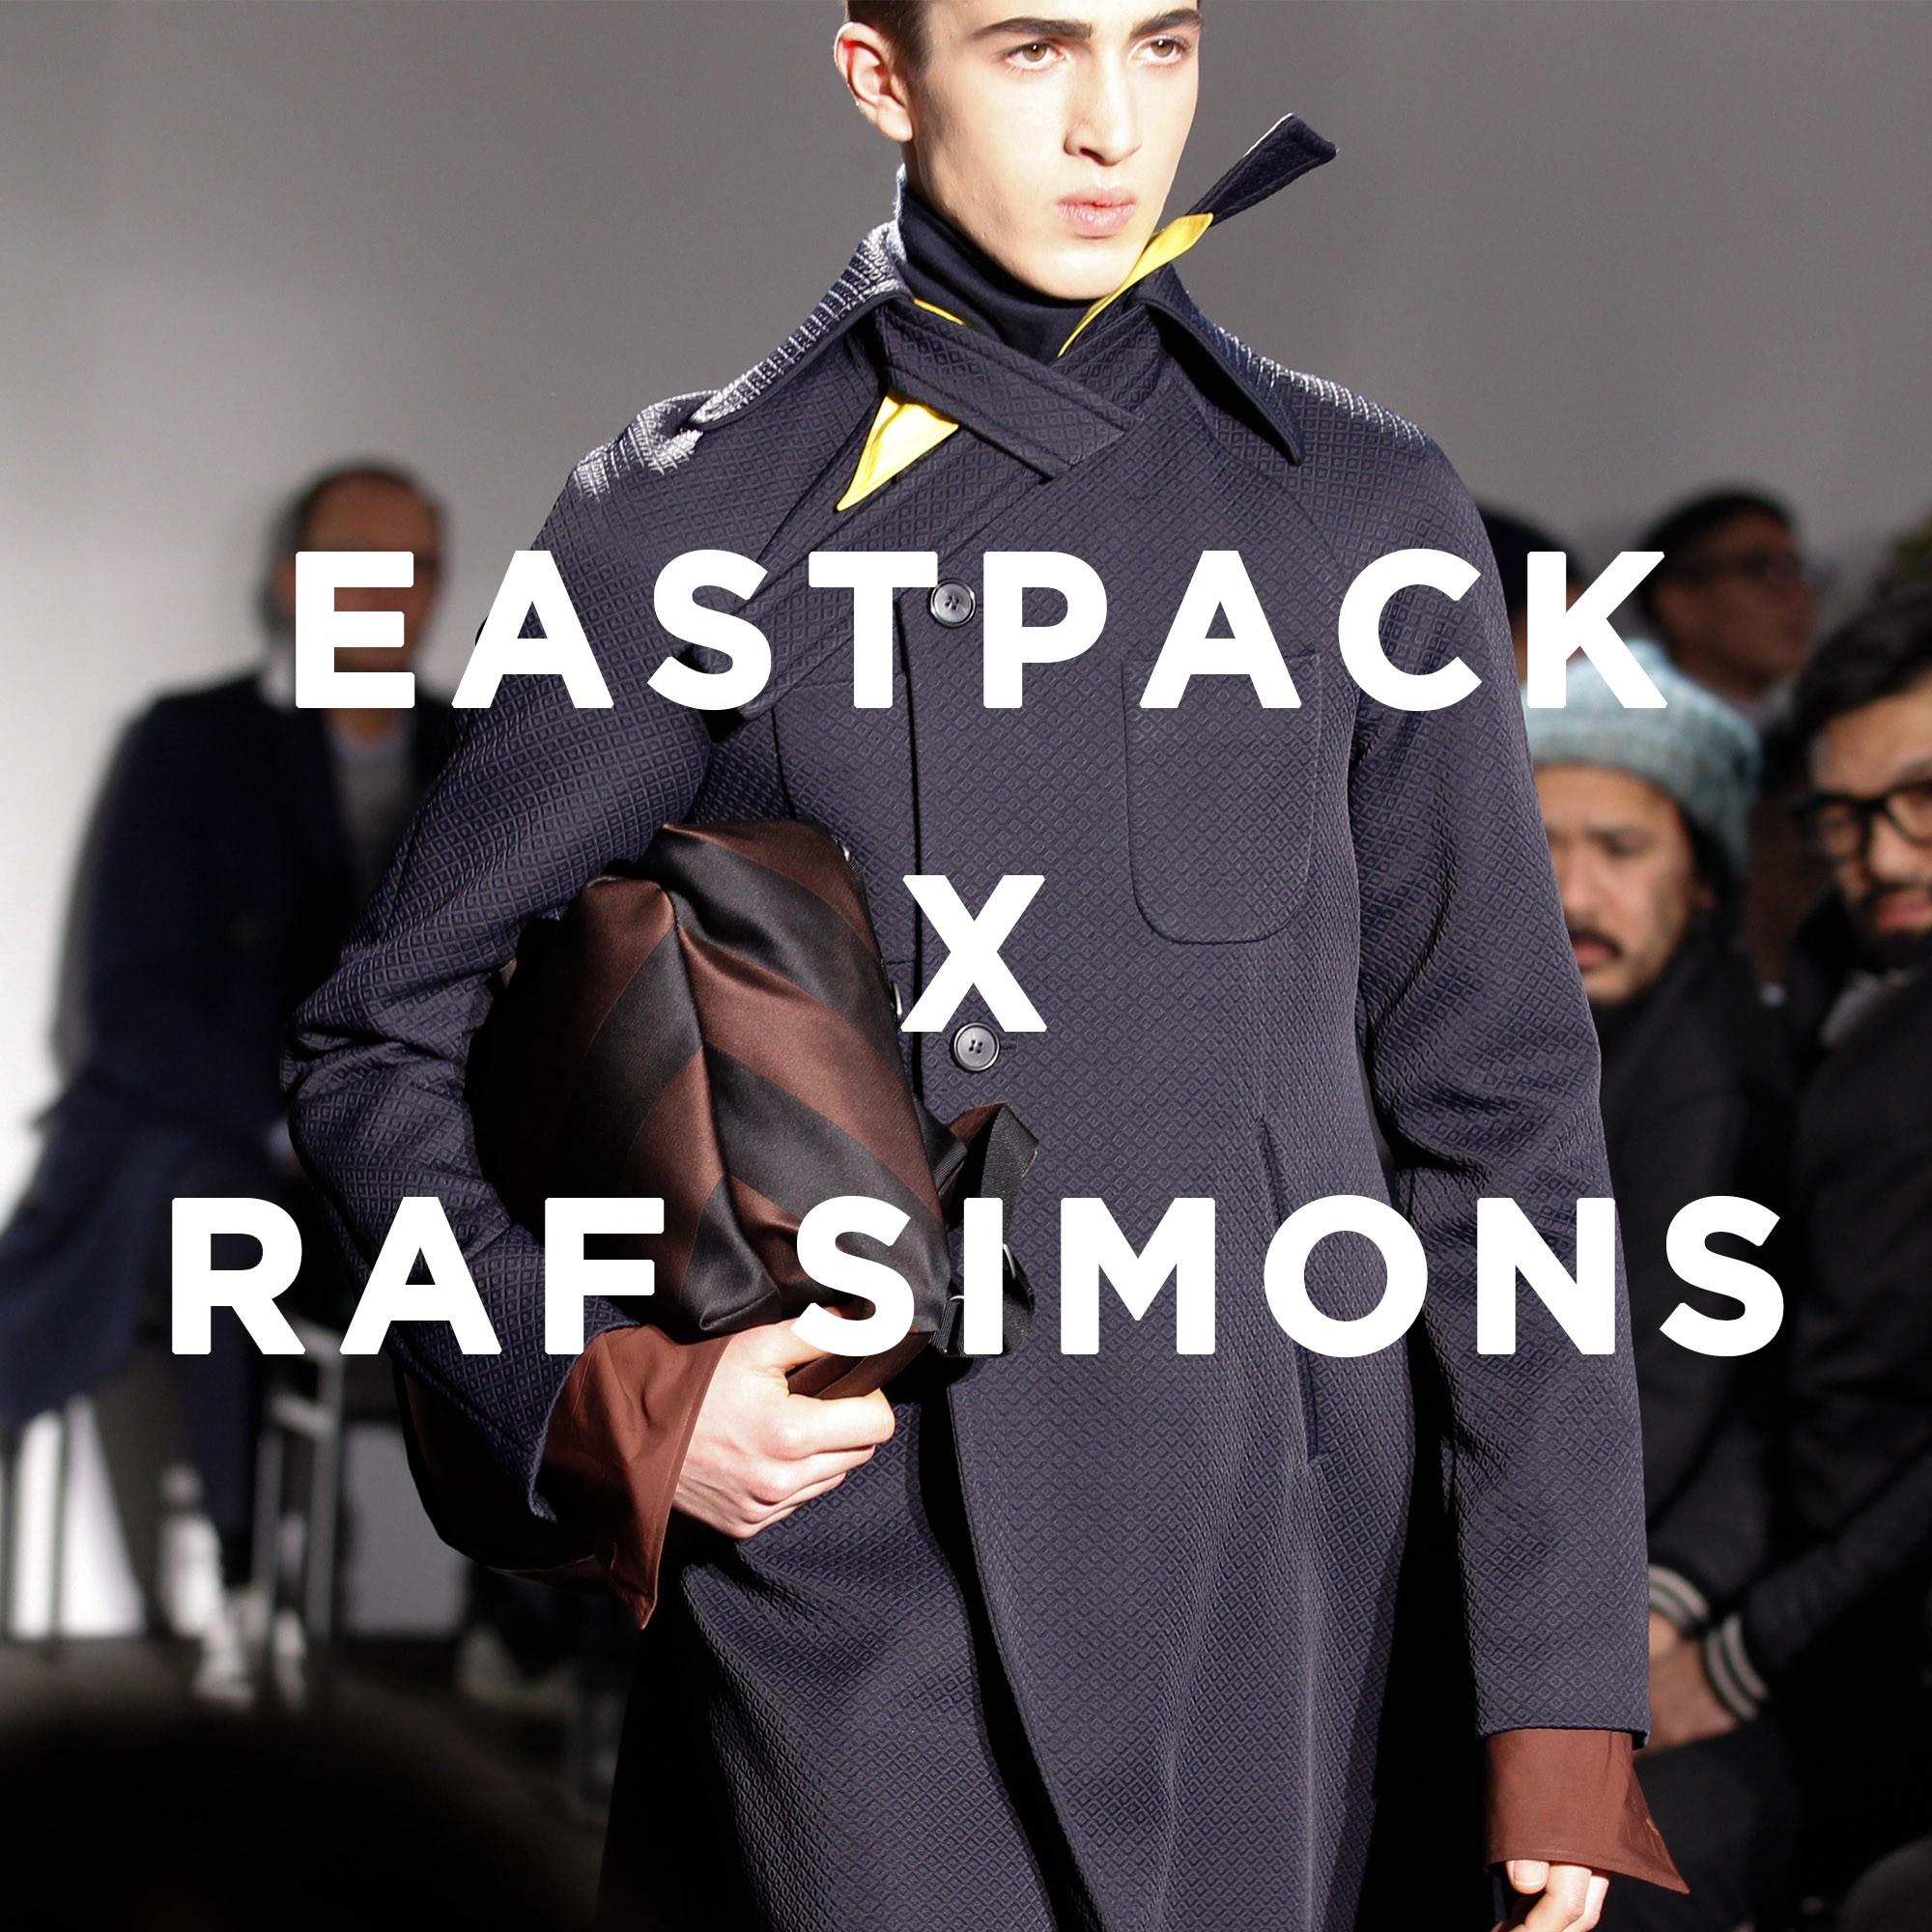 awesome backpacks by Raf